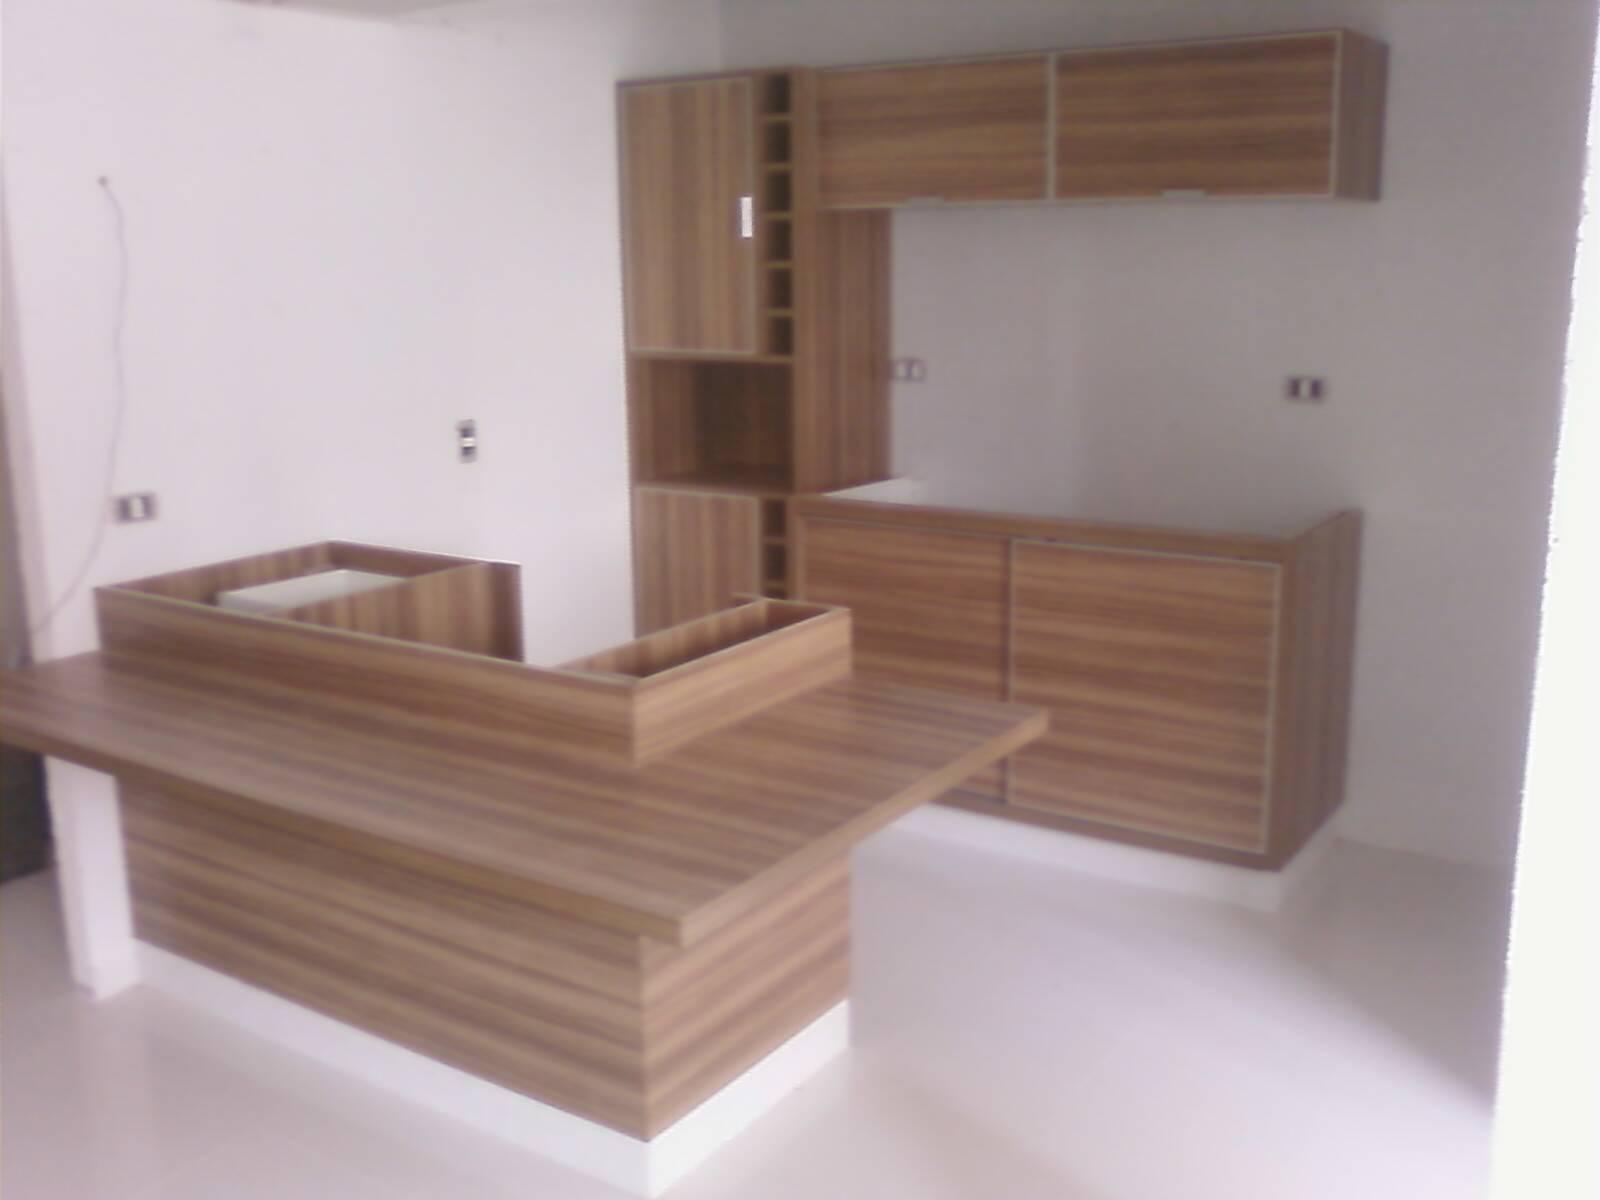 Edvaldo Cozinha Compacta Ibirapuera Sp